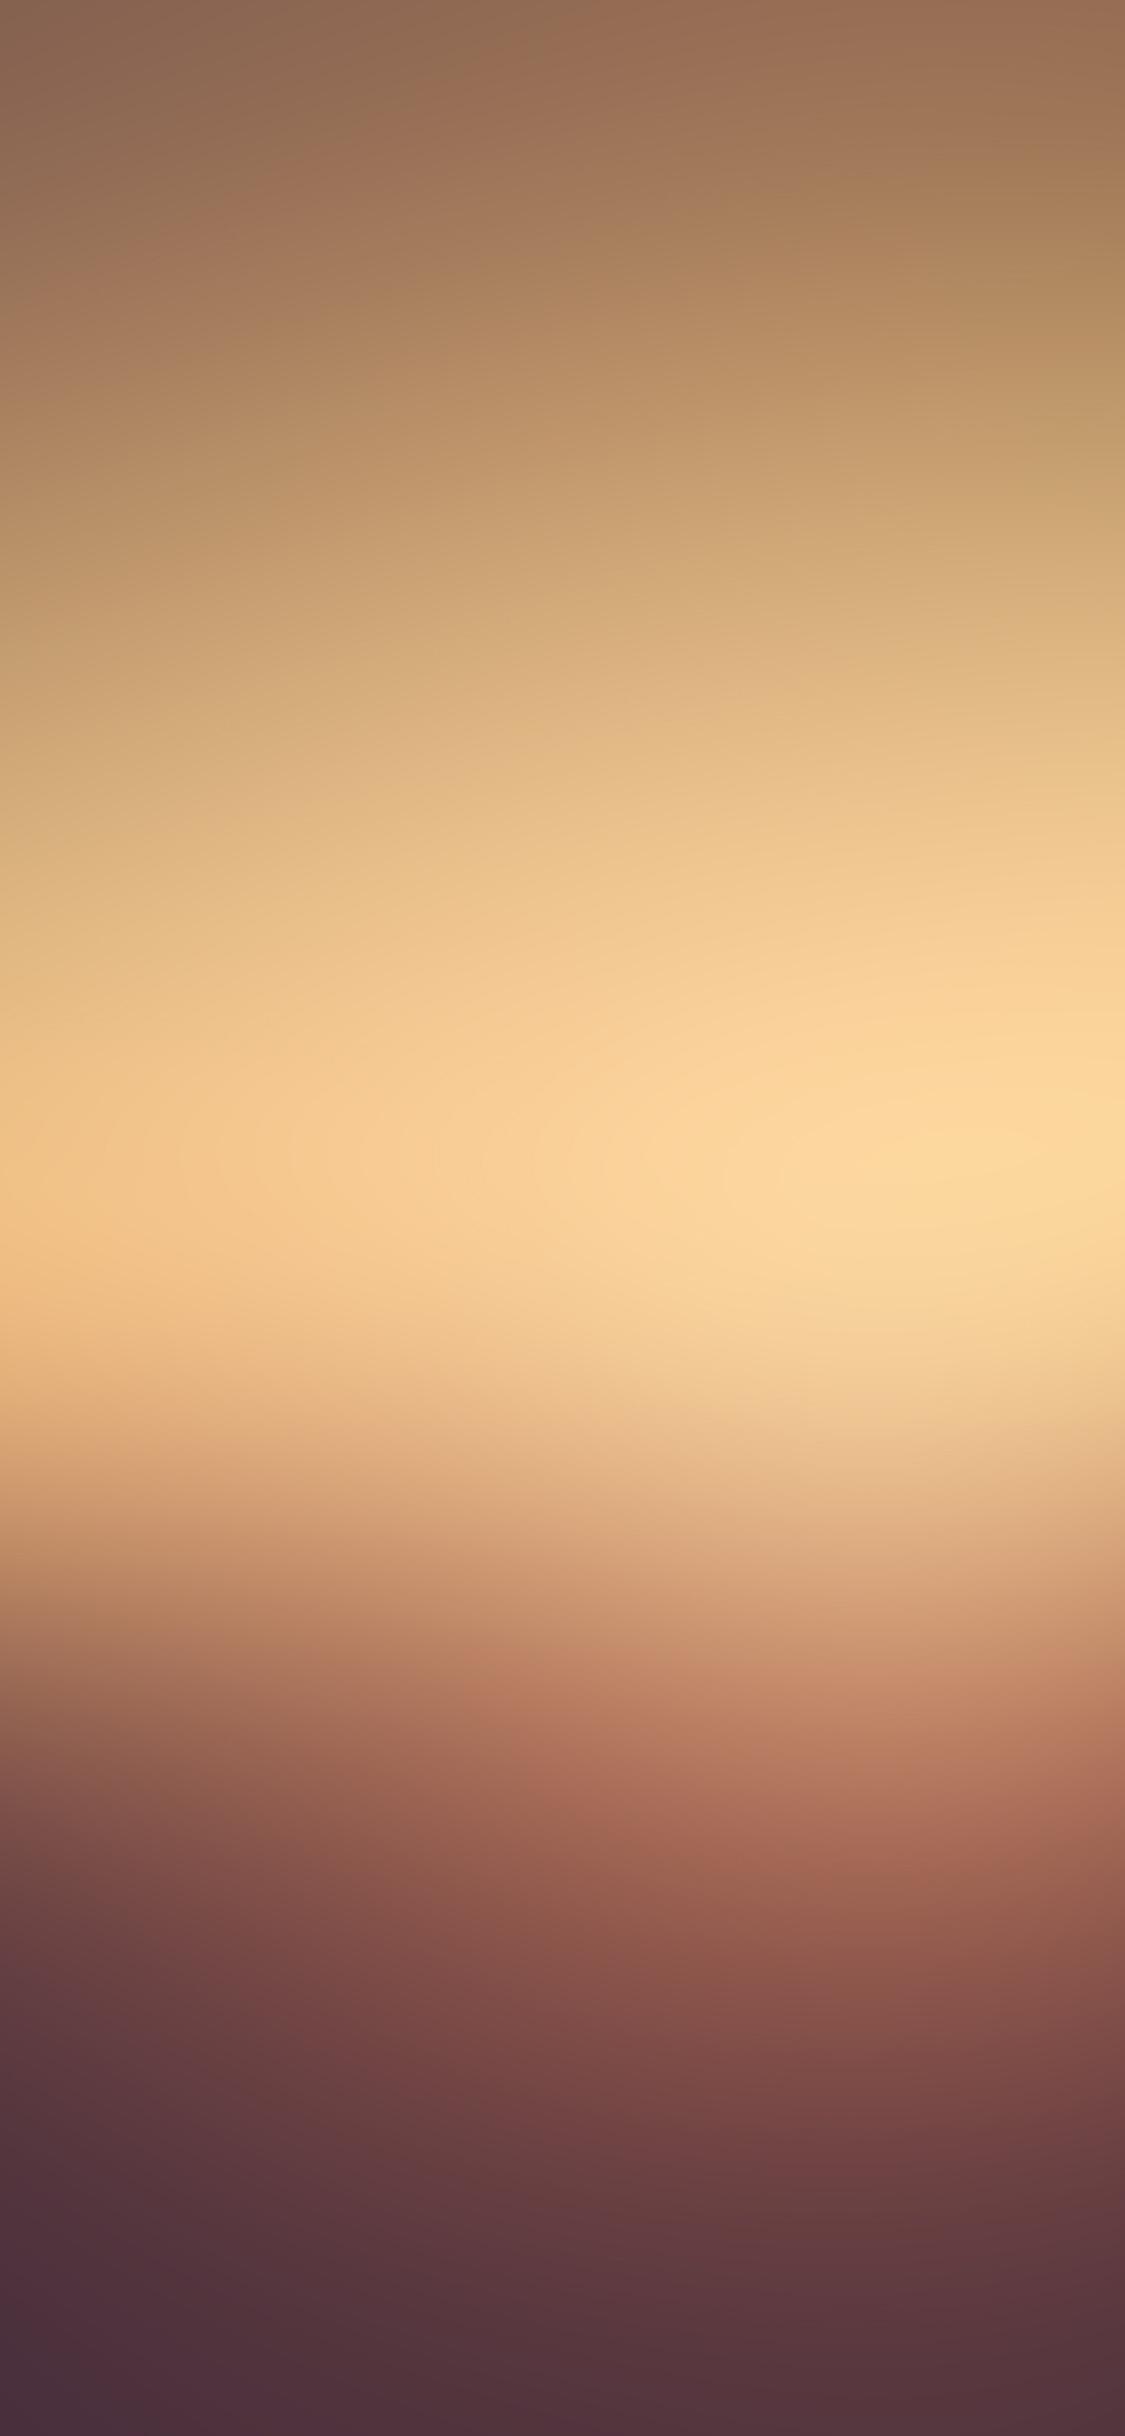 iPhoneXpapers.com-Apple-iPhone-wallpaper-sf64-city-sunset-bokeh-light-town-sky-gradation-blur